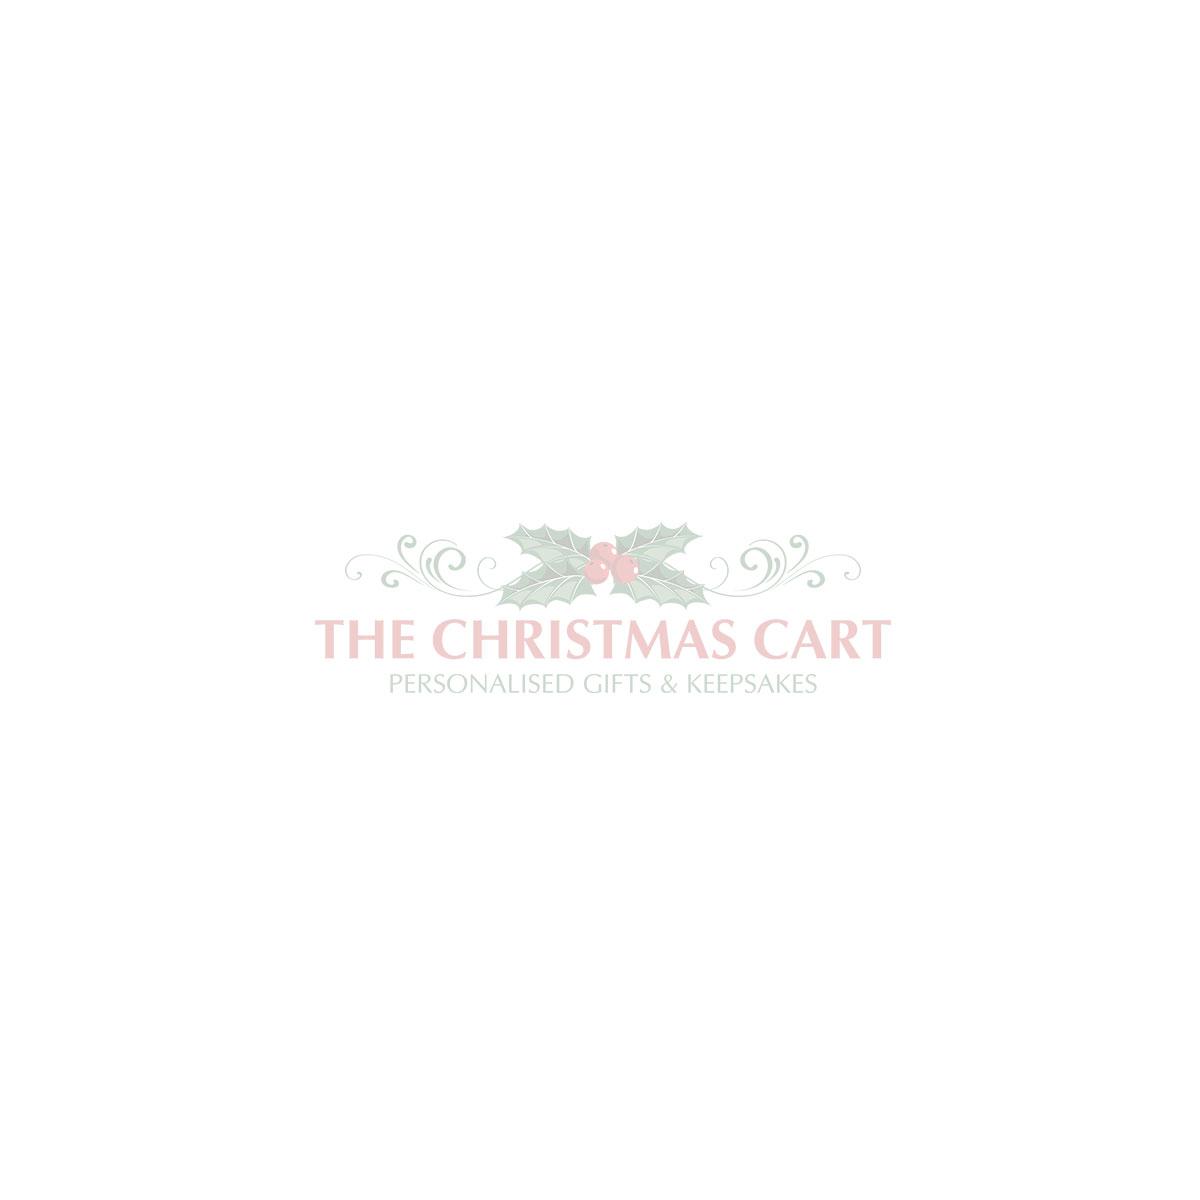 White Ceramic Milk bottle Vase with Berries - Tree